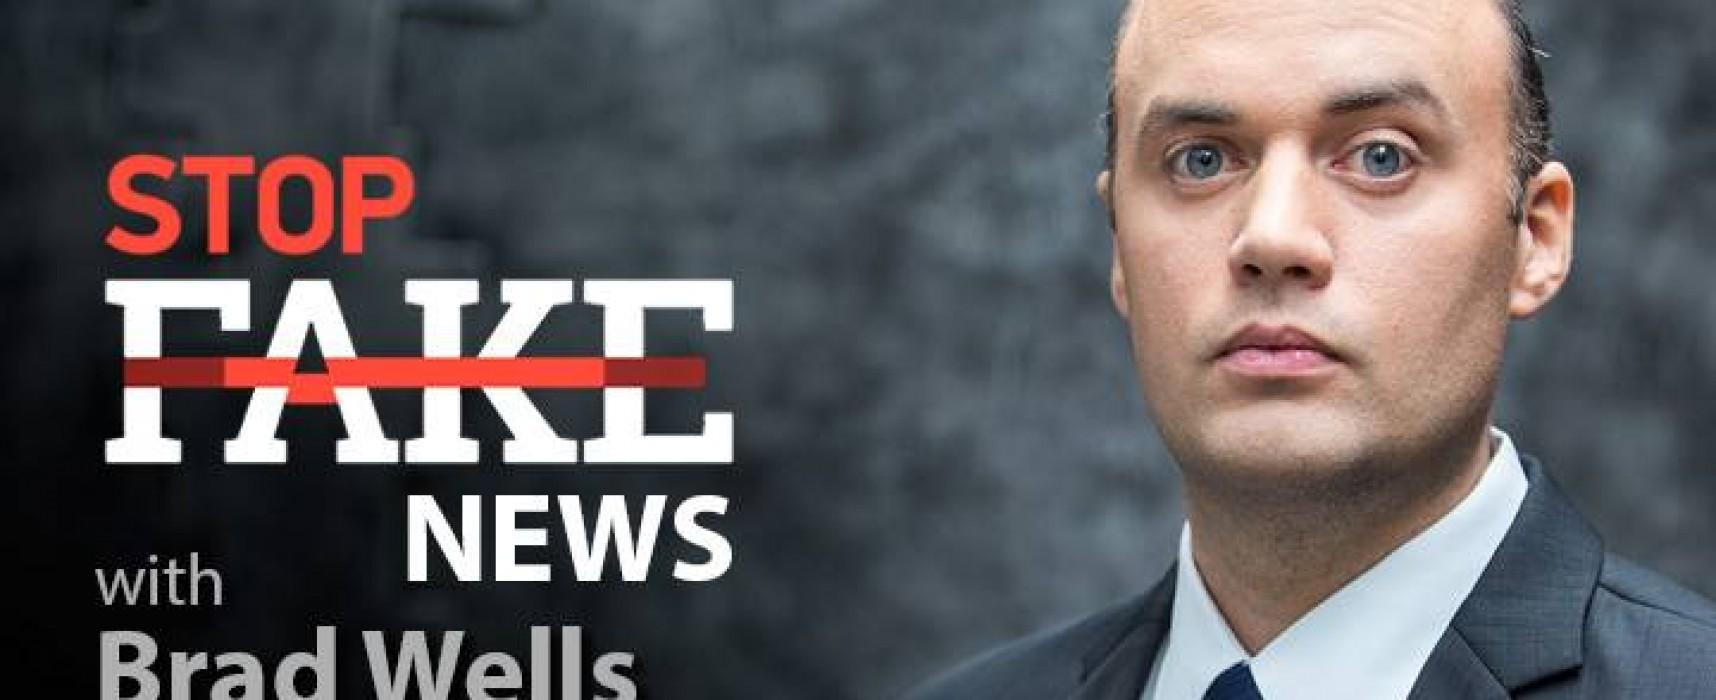 StopFakeNews #72. [Engels] met Brad Wells